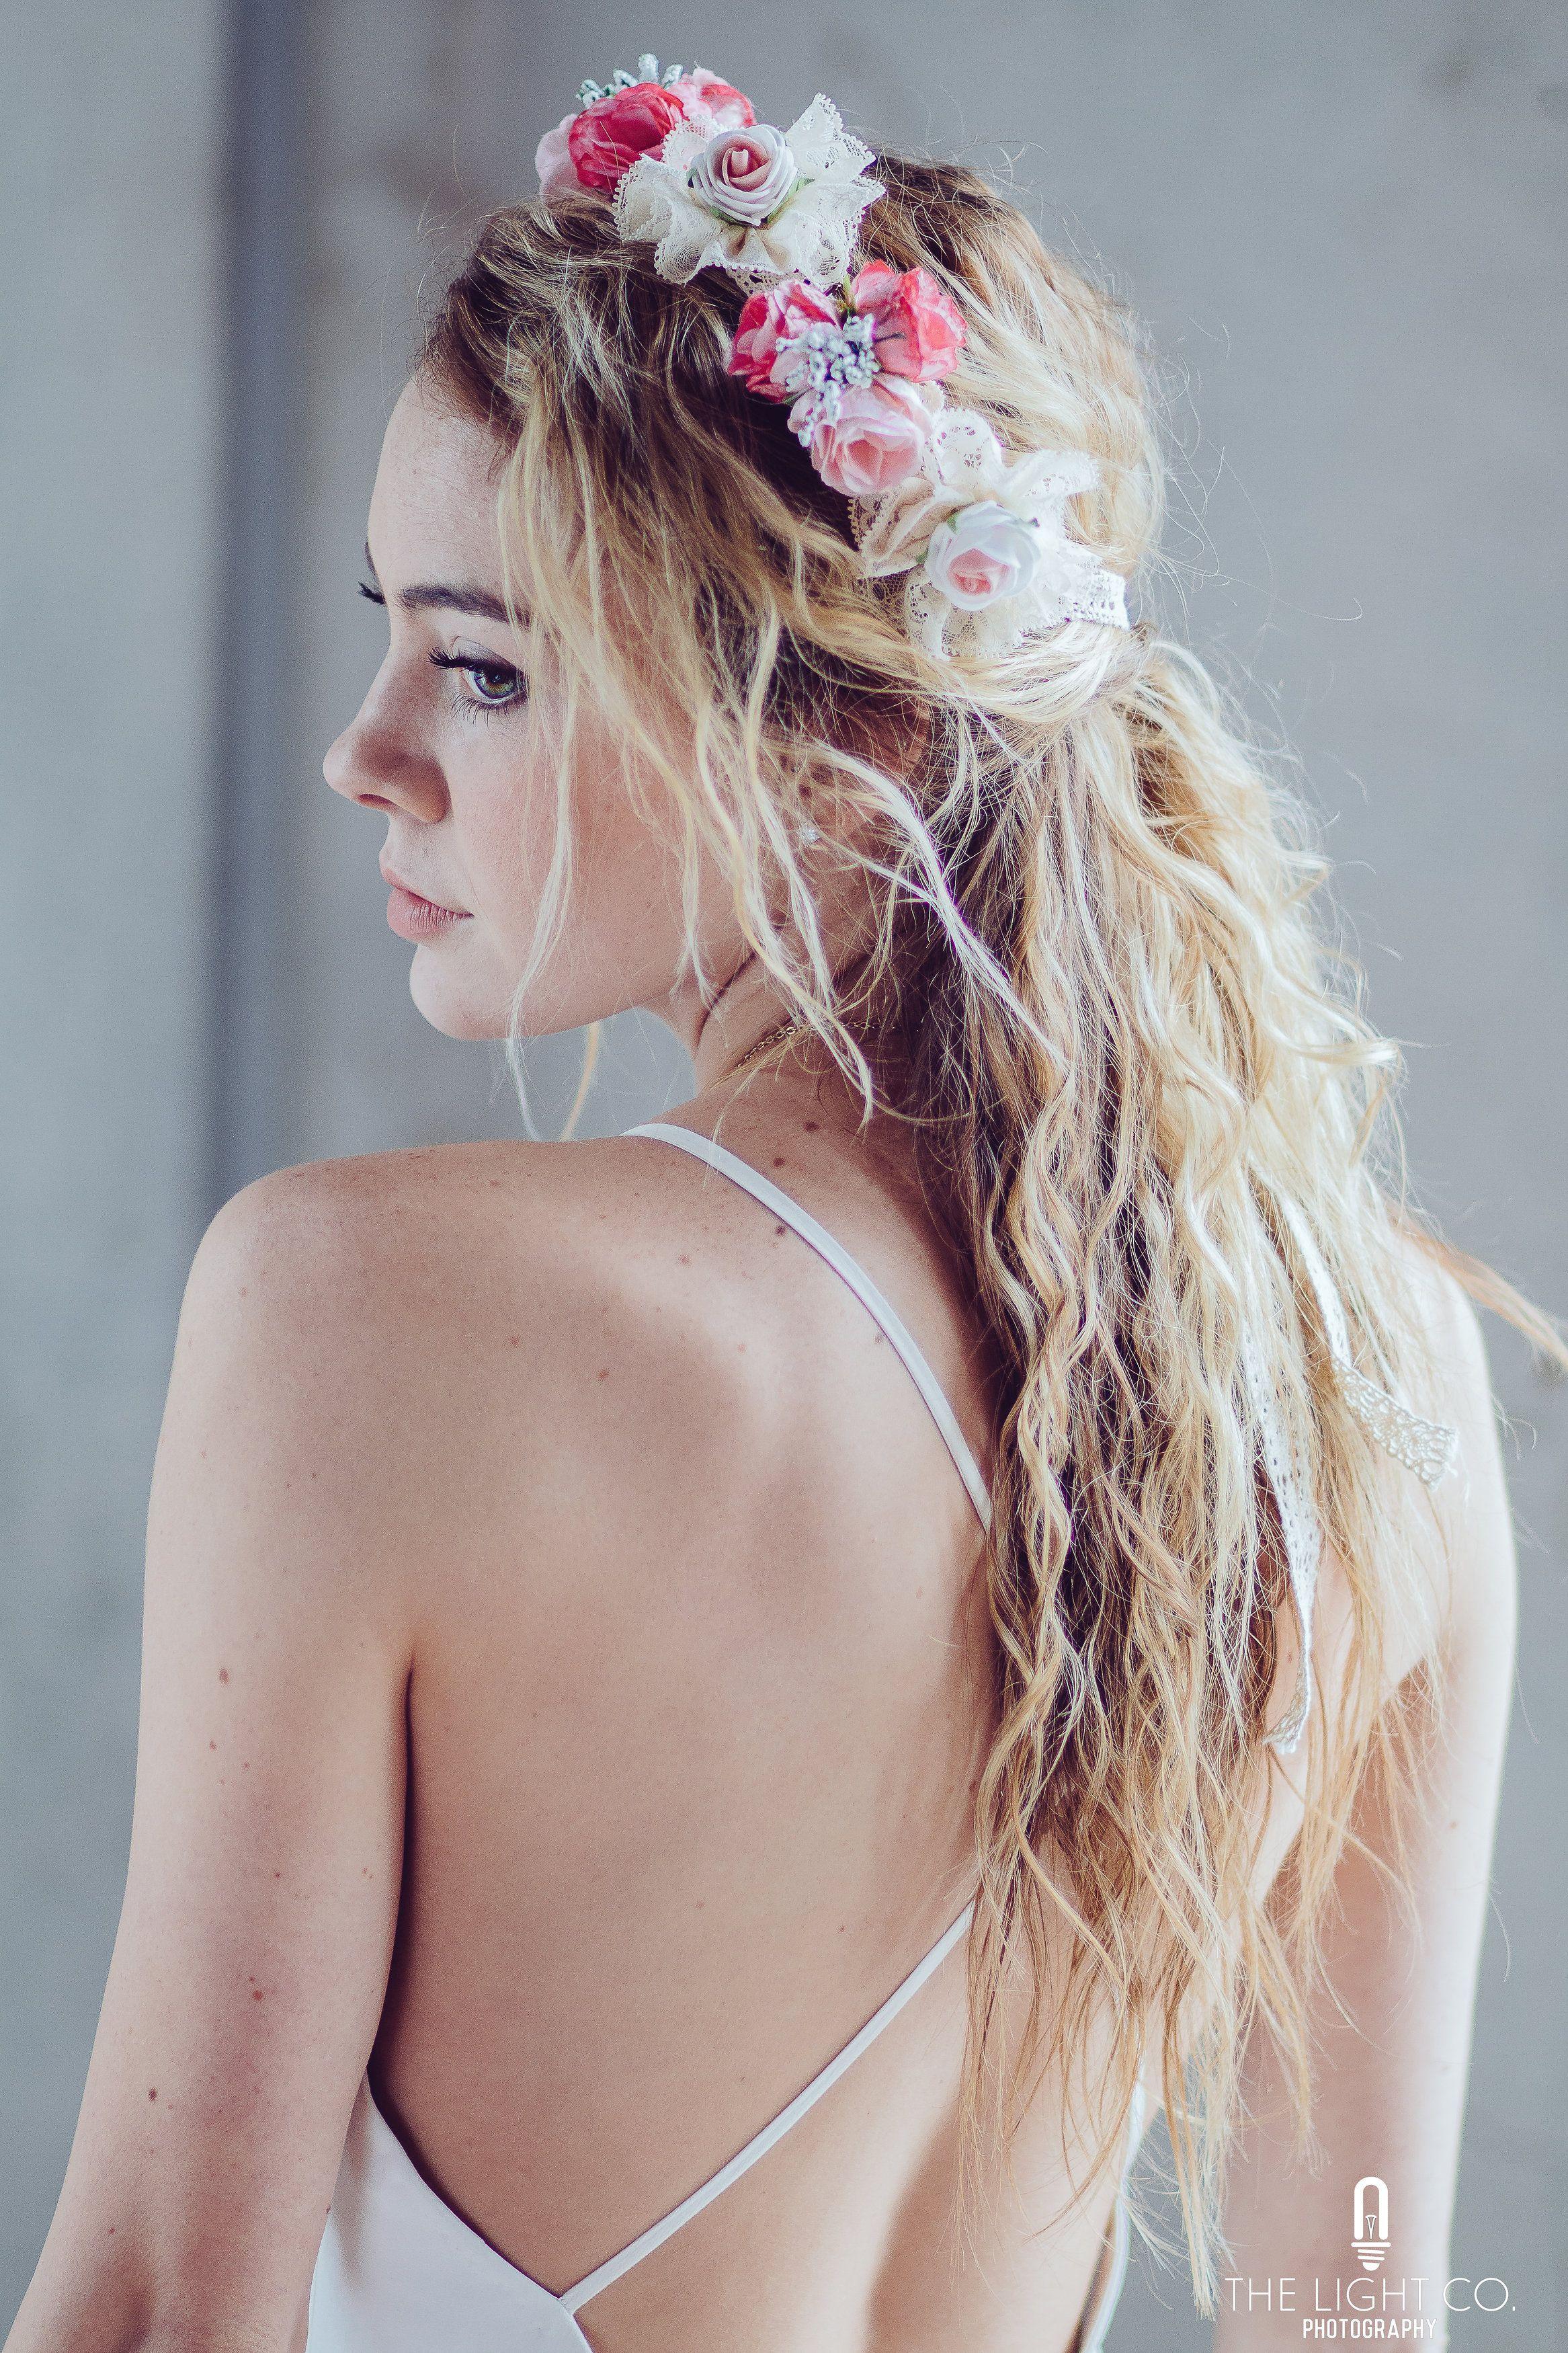 Haley Nicole Permenter nudes (34 photo) Gallery, 2015, cameltoe